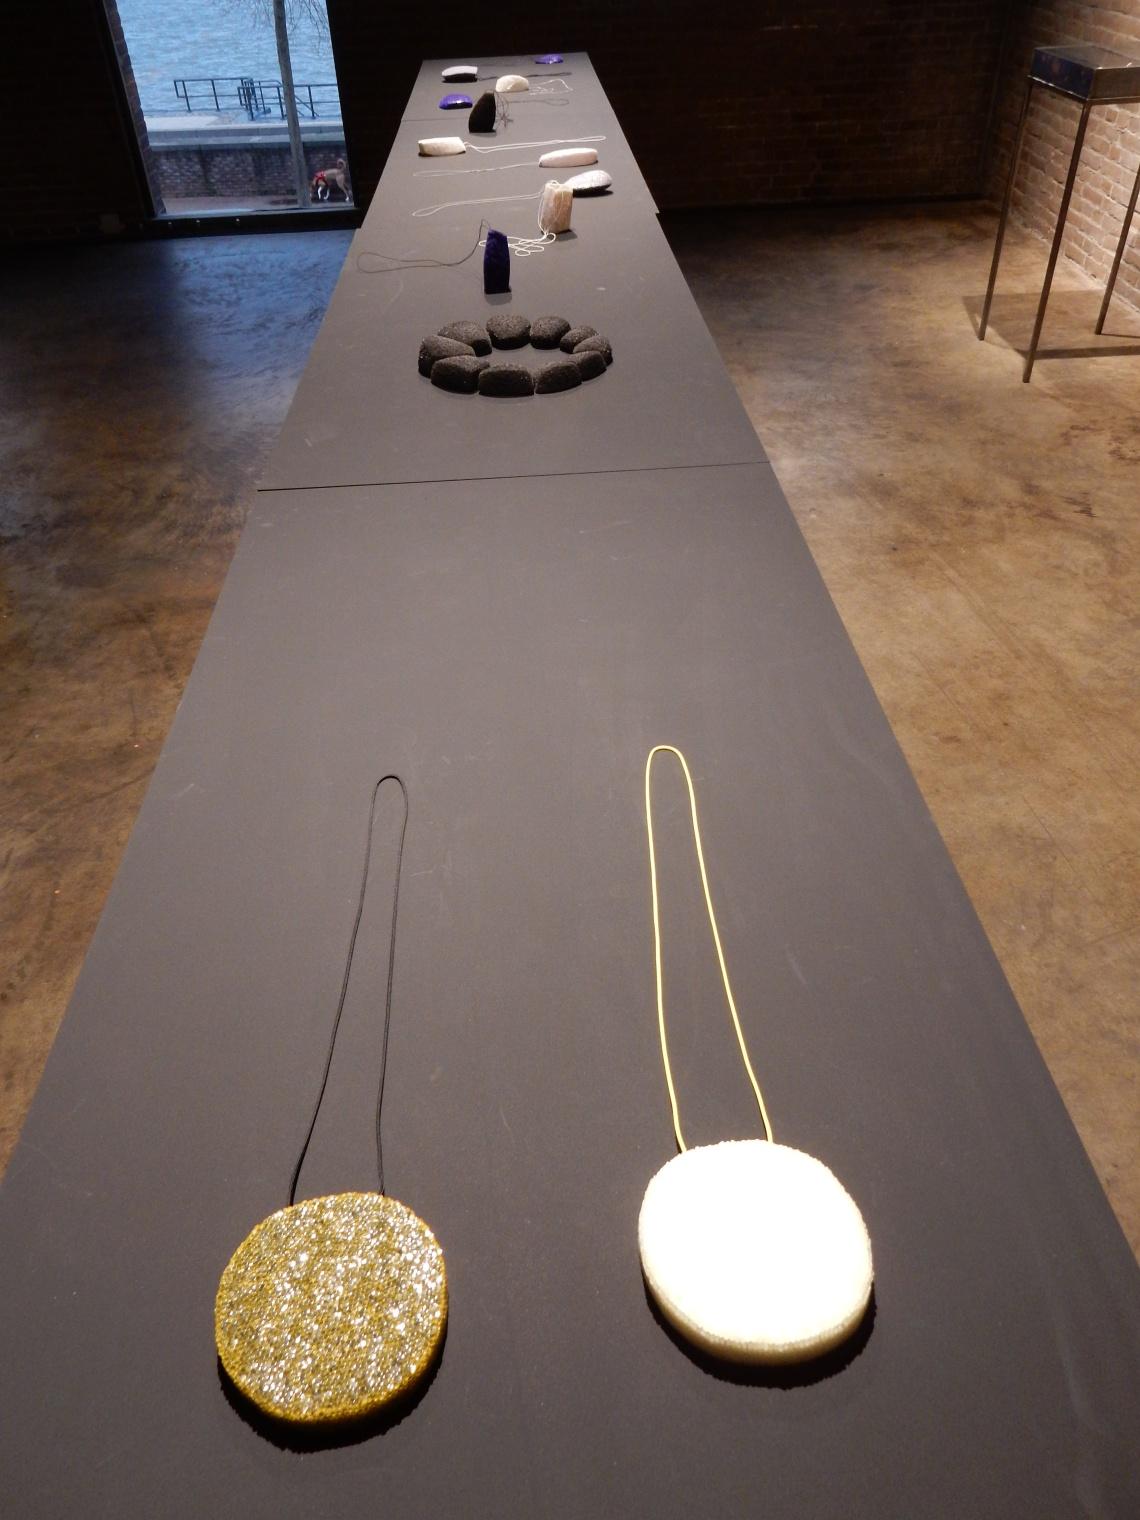 Karin Seufert. Galerie Marzee. Foto Esther Doornbusch, 22 december 2018, CC BY 4.0